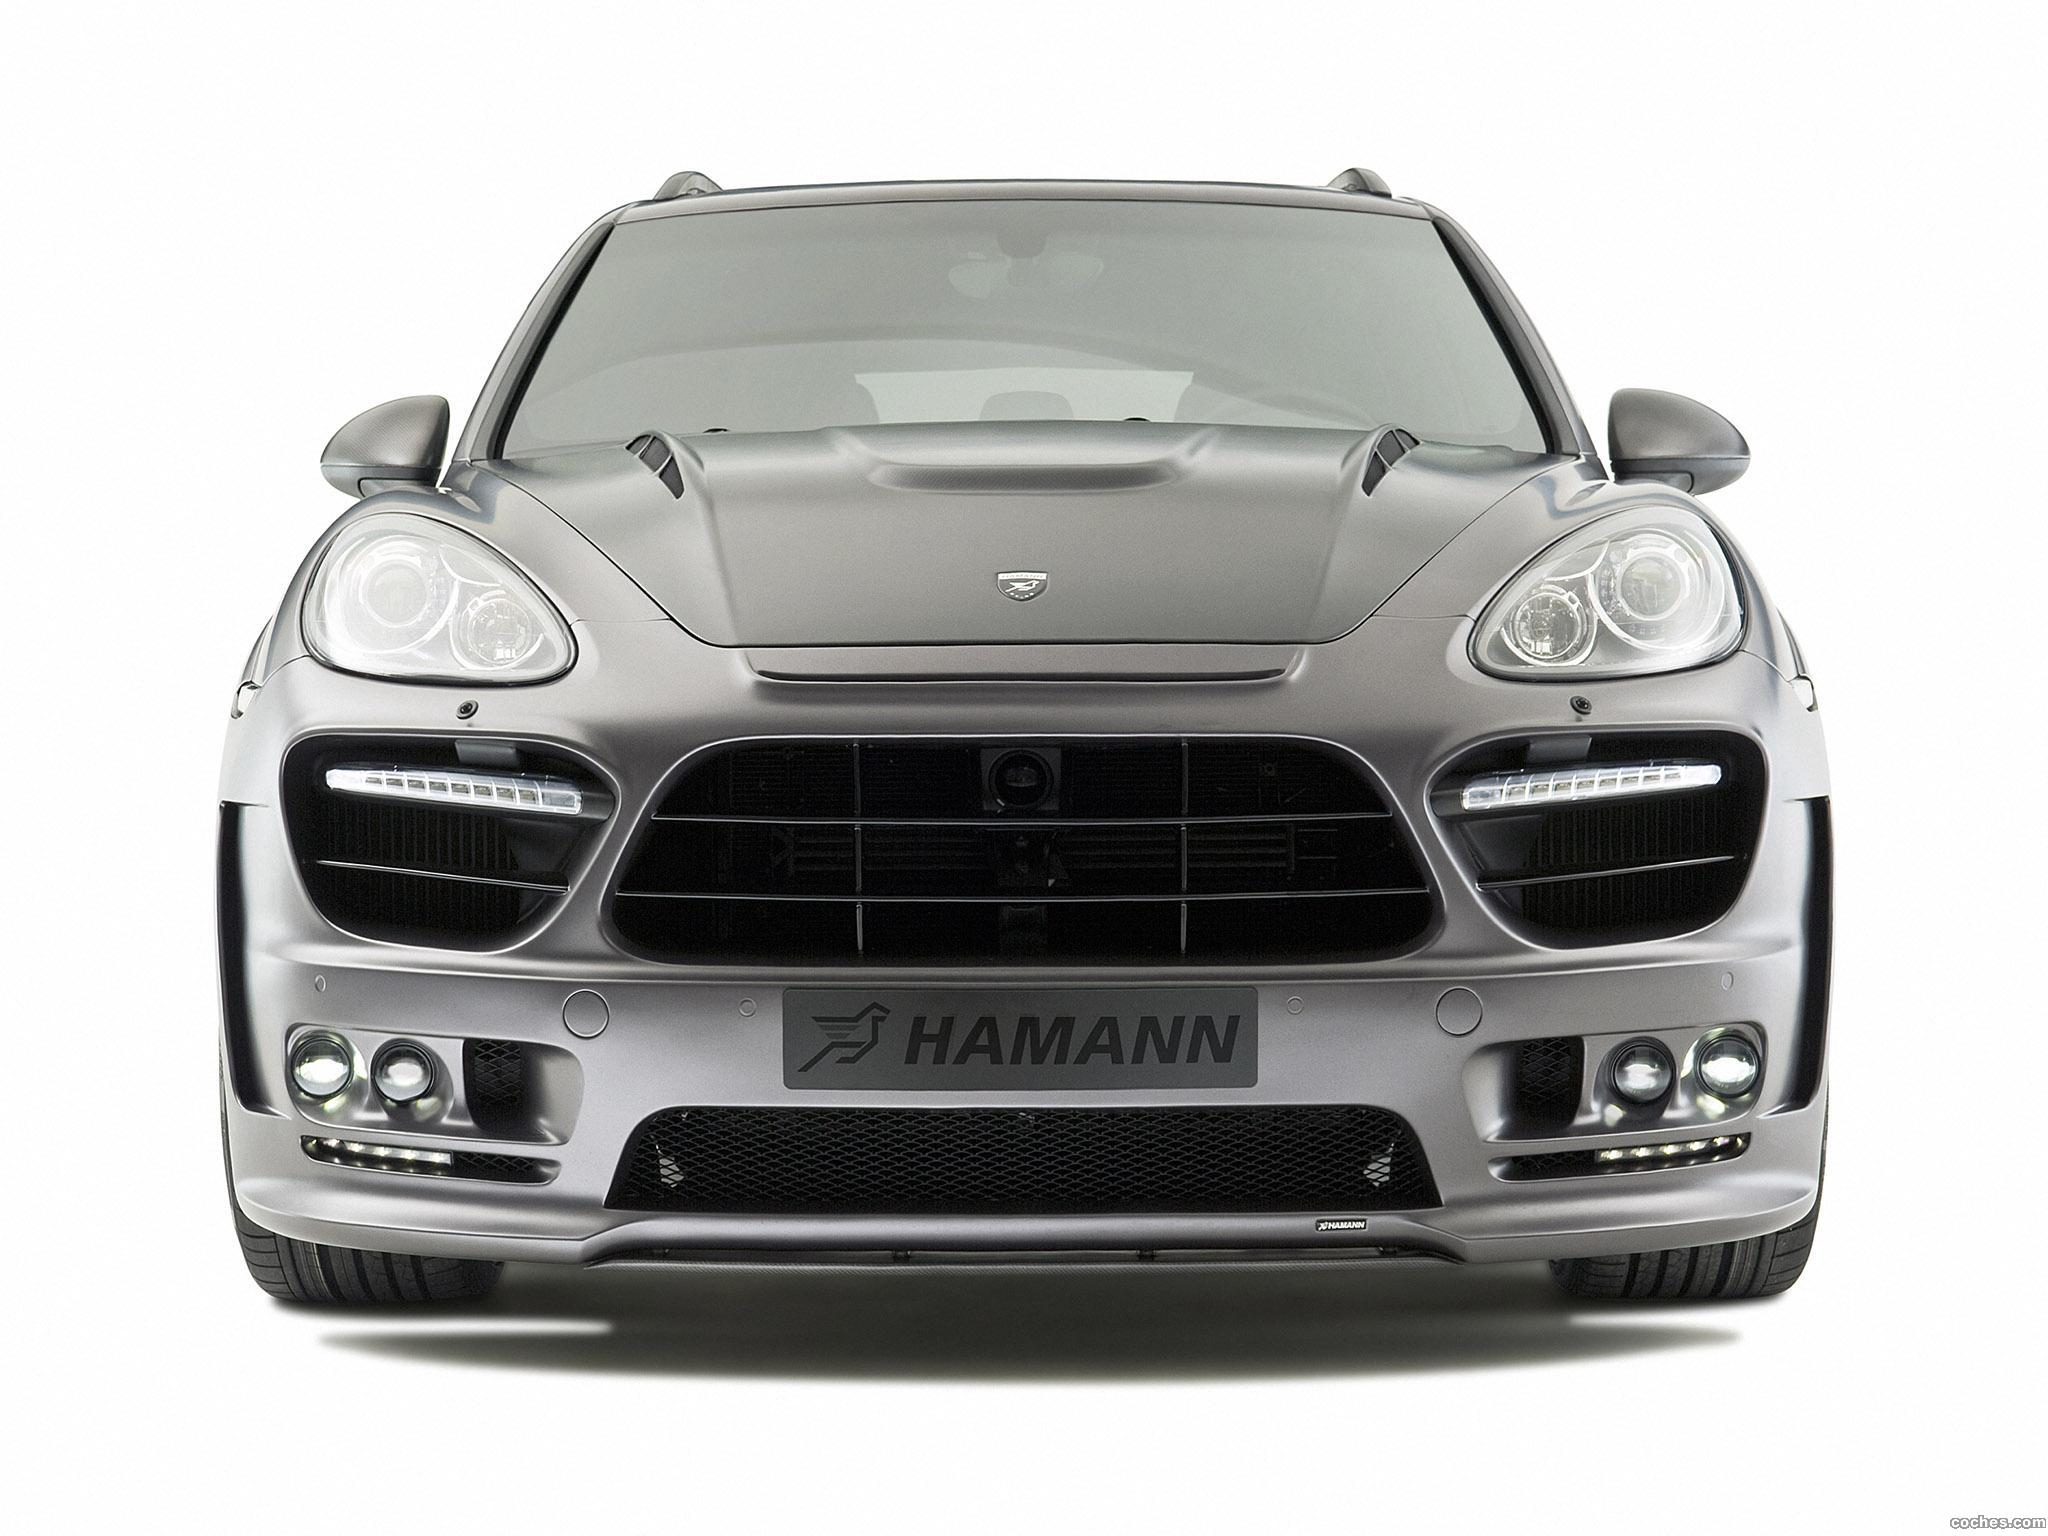 Foto 3 de Hamann Porsche Cayenne Guardian 2011